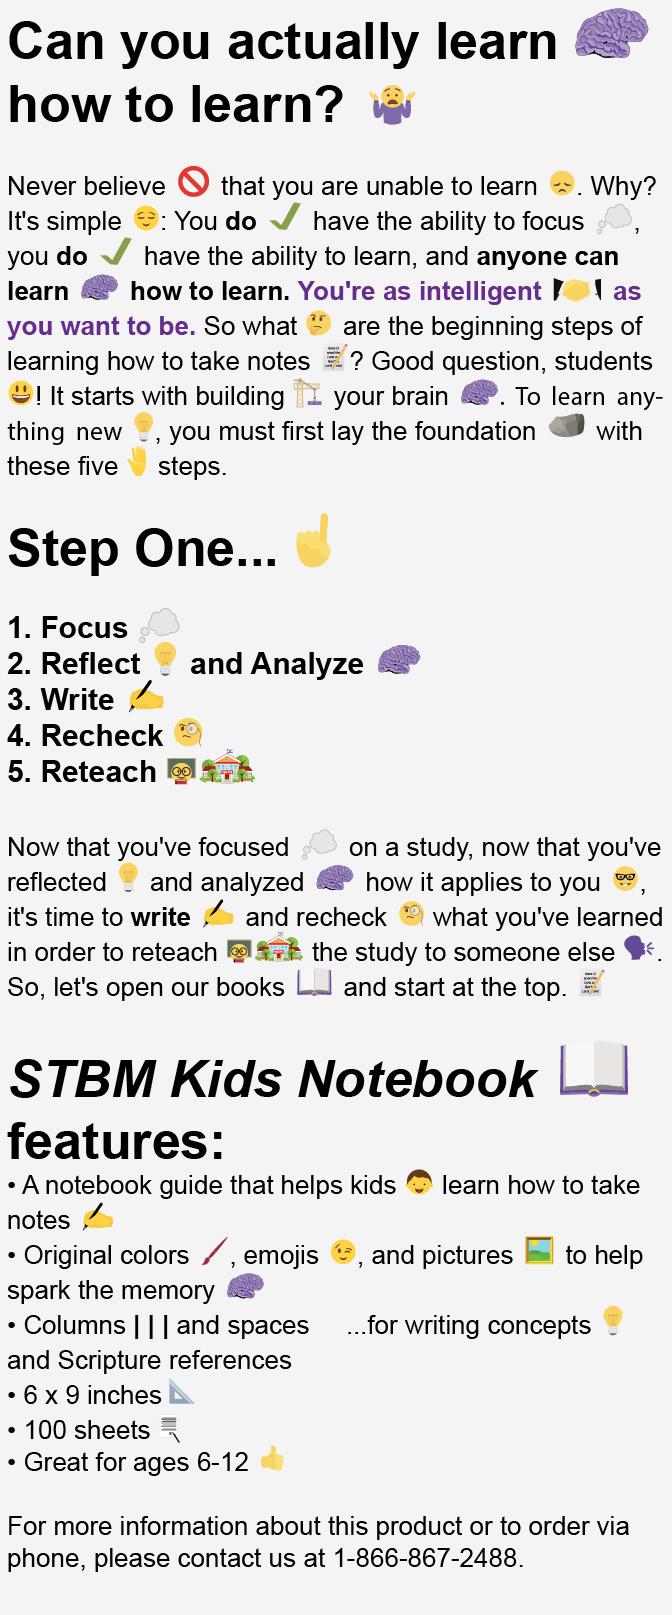 stbm-kids-notebook-extra-large-text-final-simchat-torah-beit-midrash-new-.png